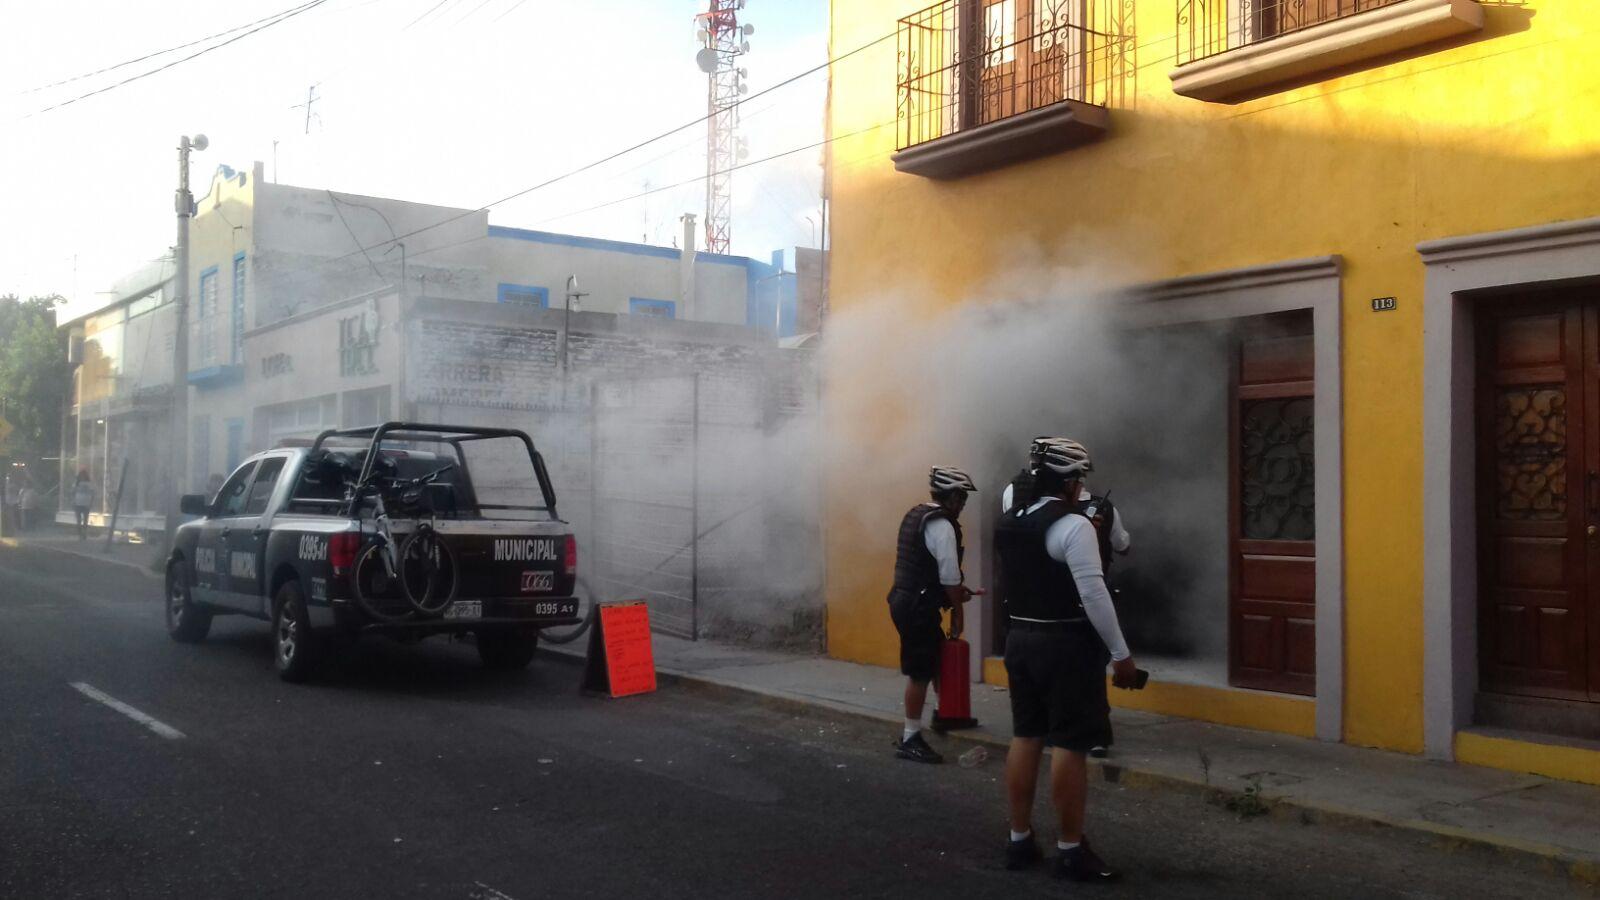 ¡Flamazo en un negocio de churros en Aguascalientes dejó una joven quemada!